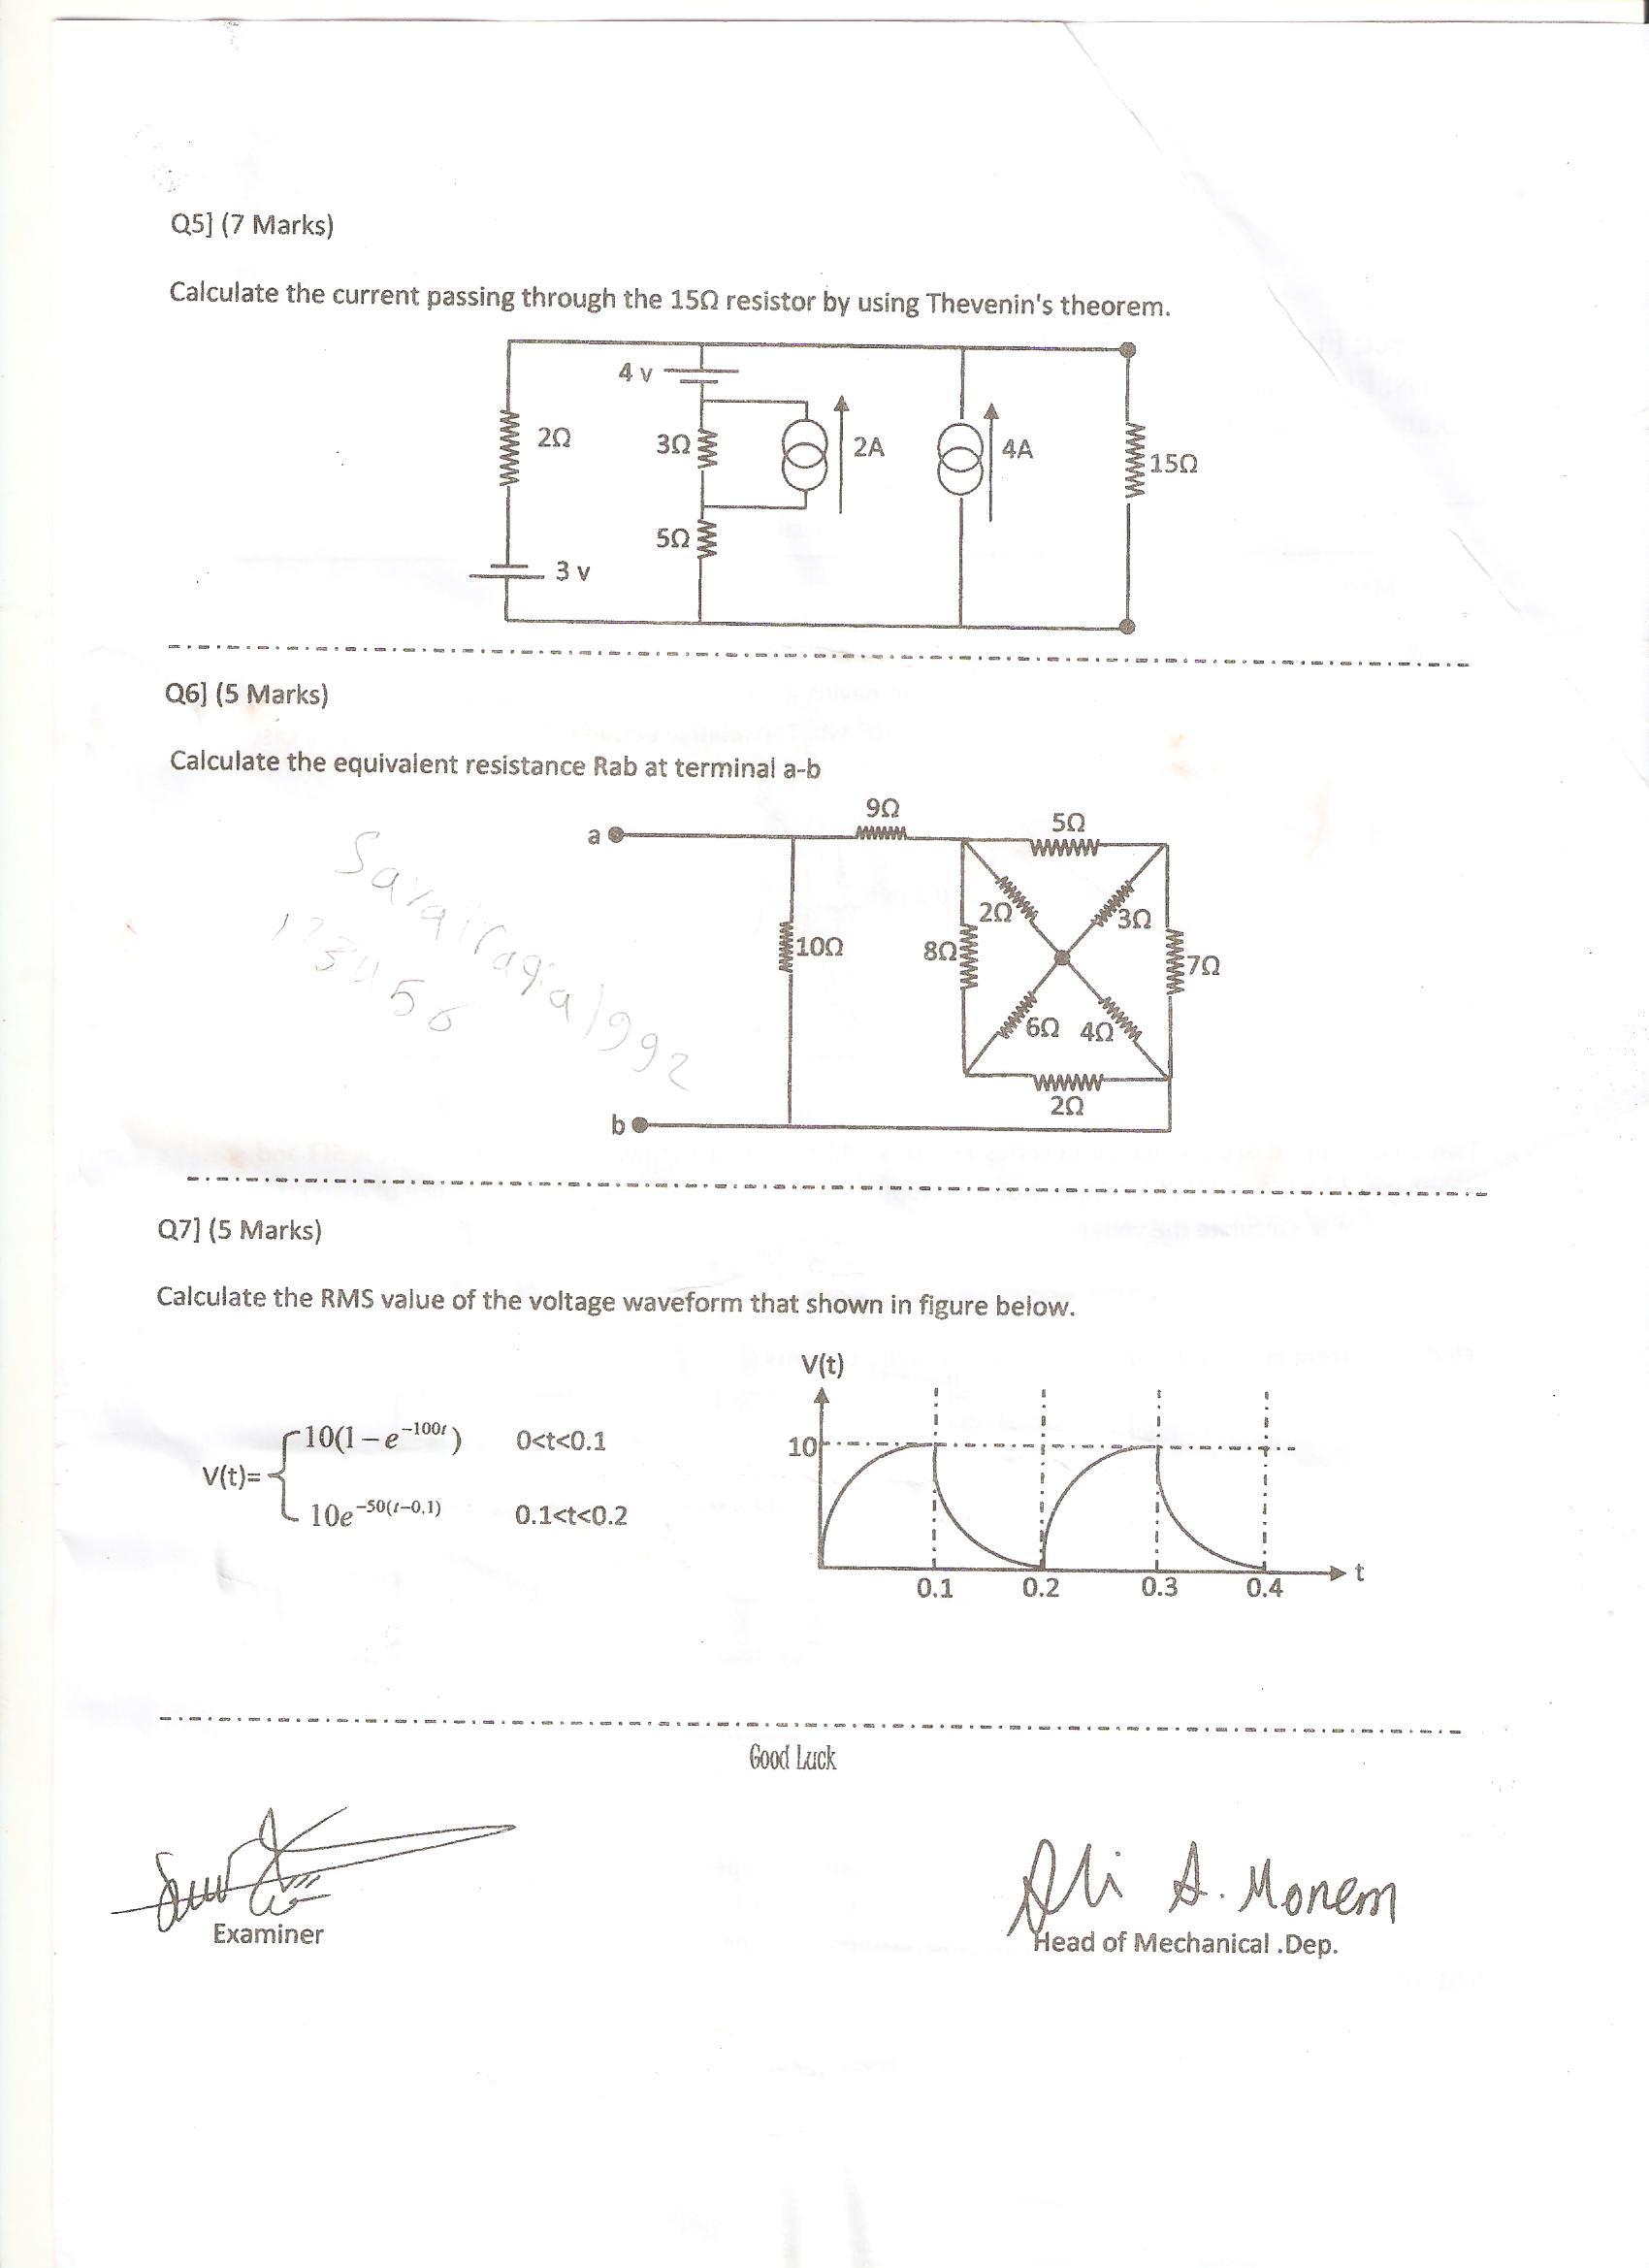 مجموعة اسئلة امتحانات 2012 Uuoooo11